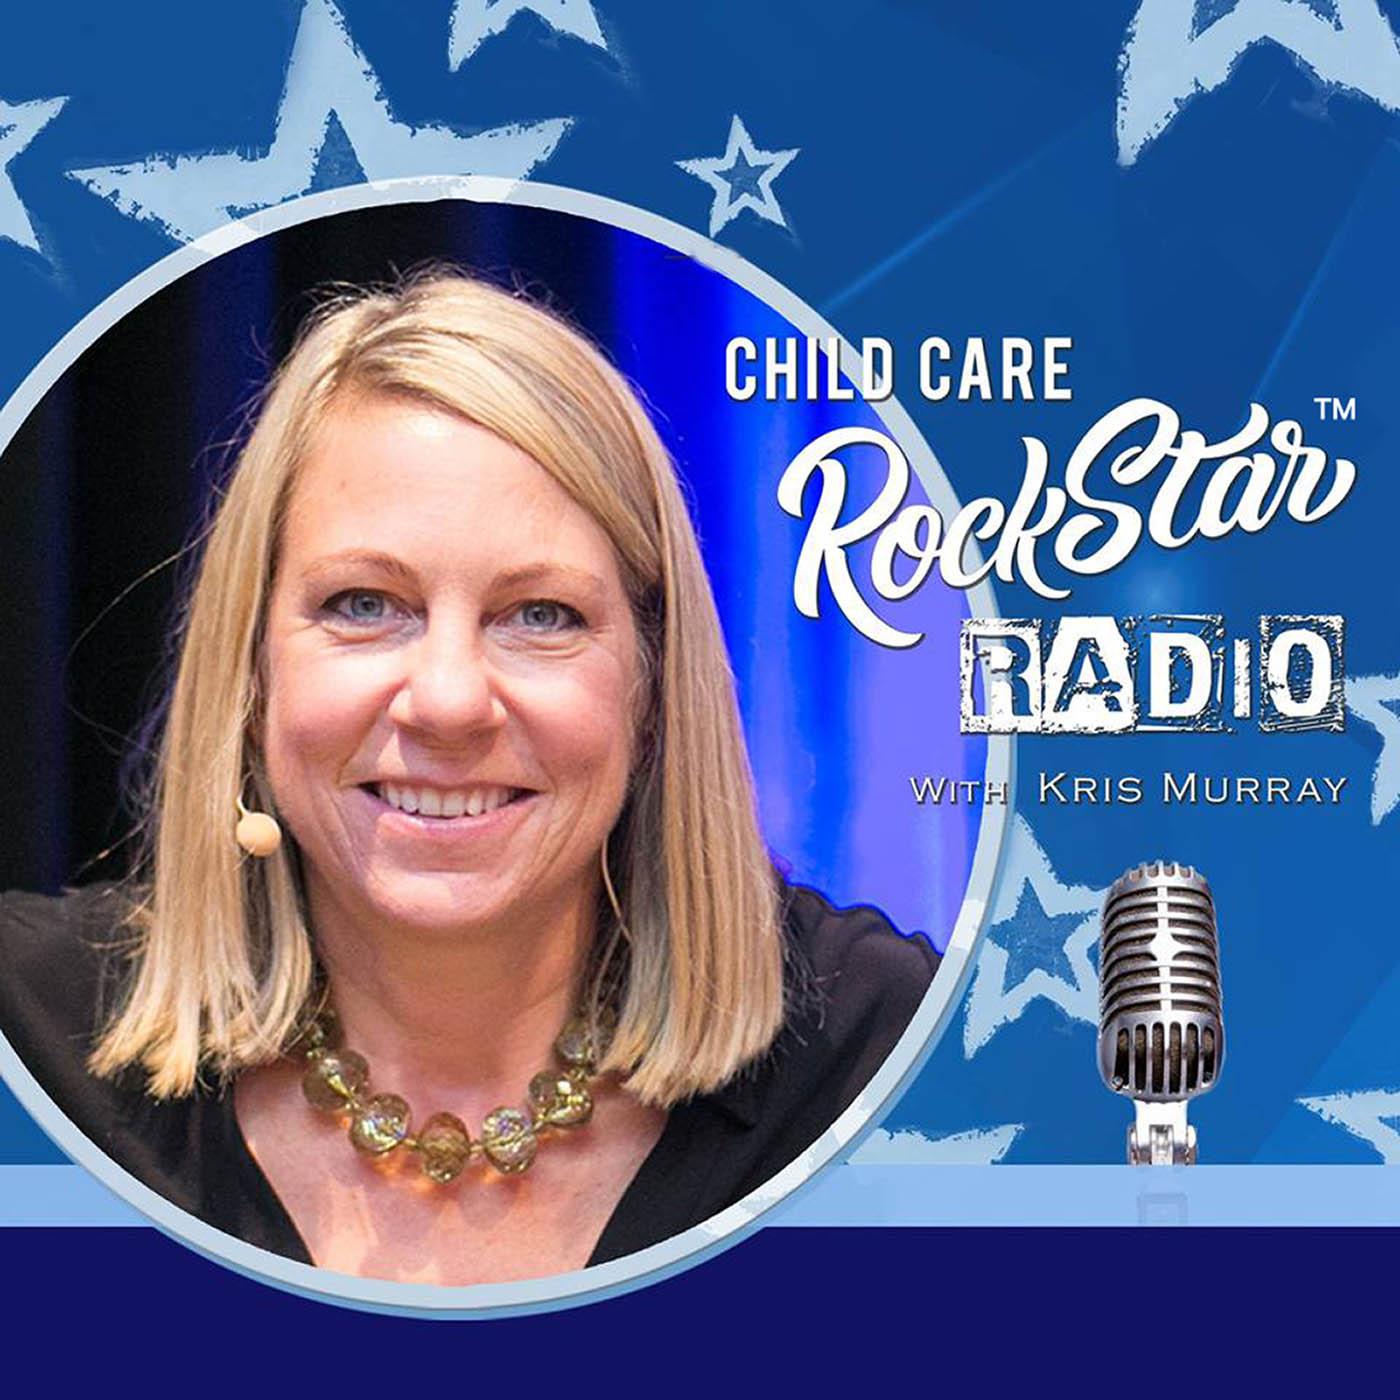 Child Care Rockstar Radio  show art